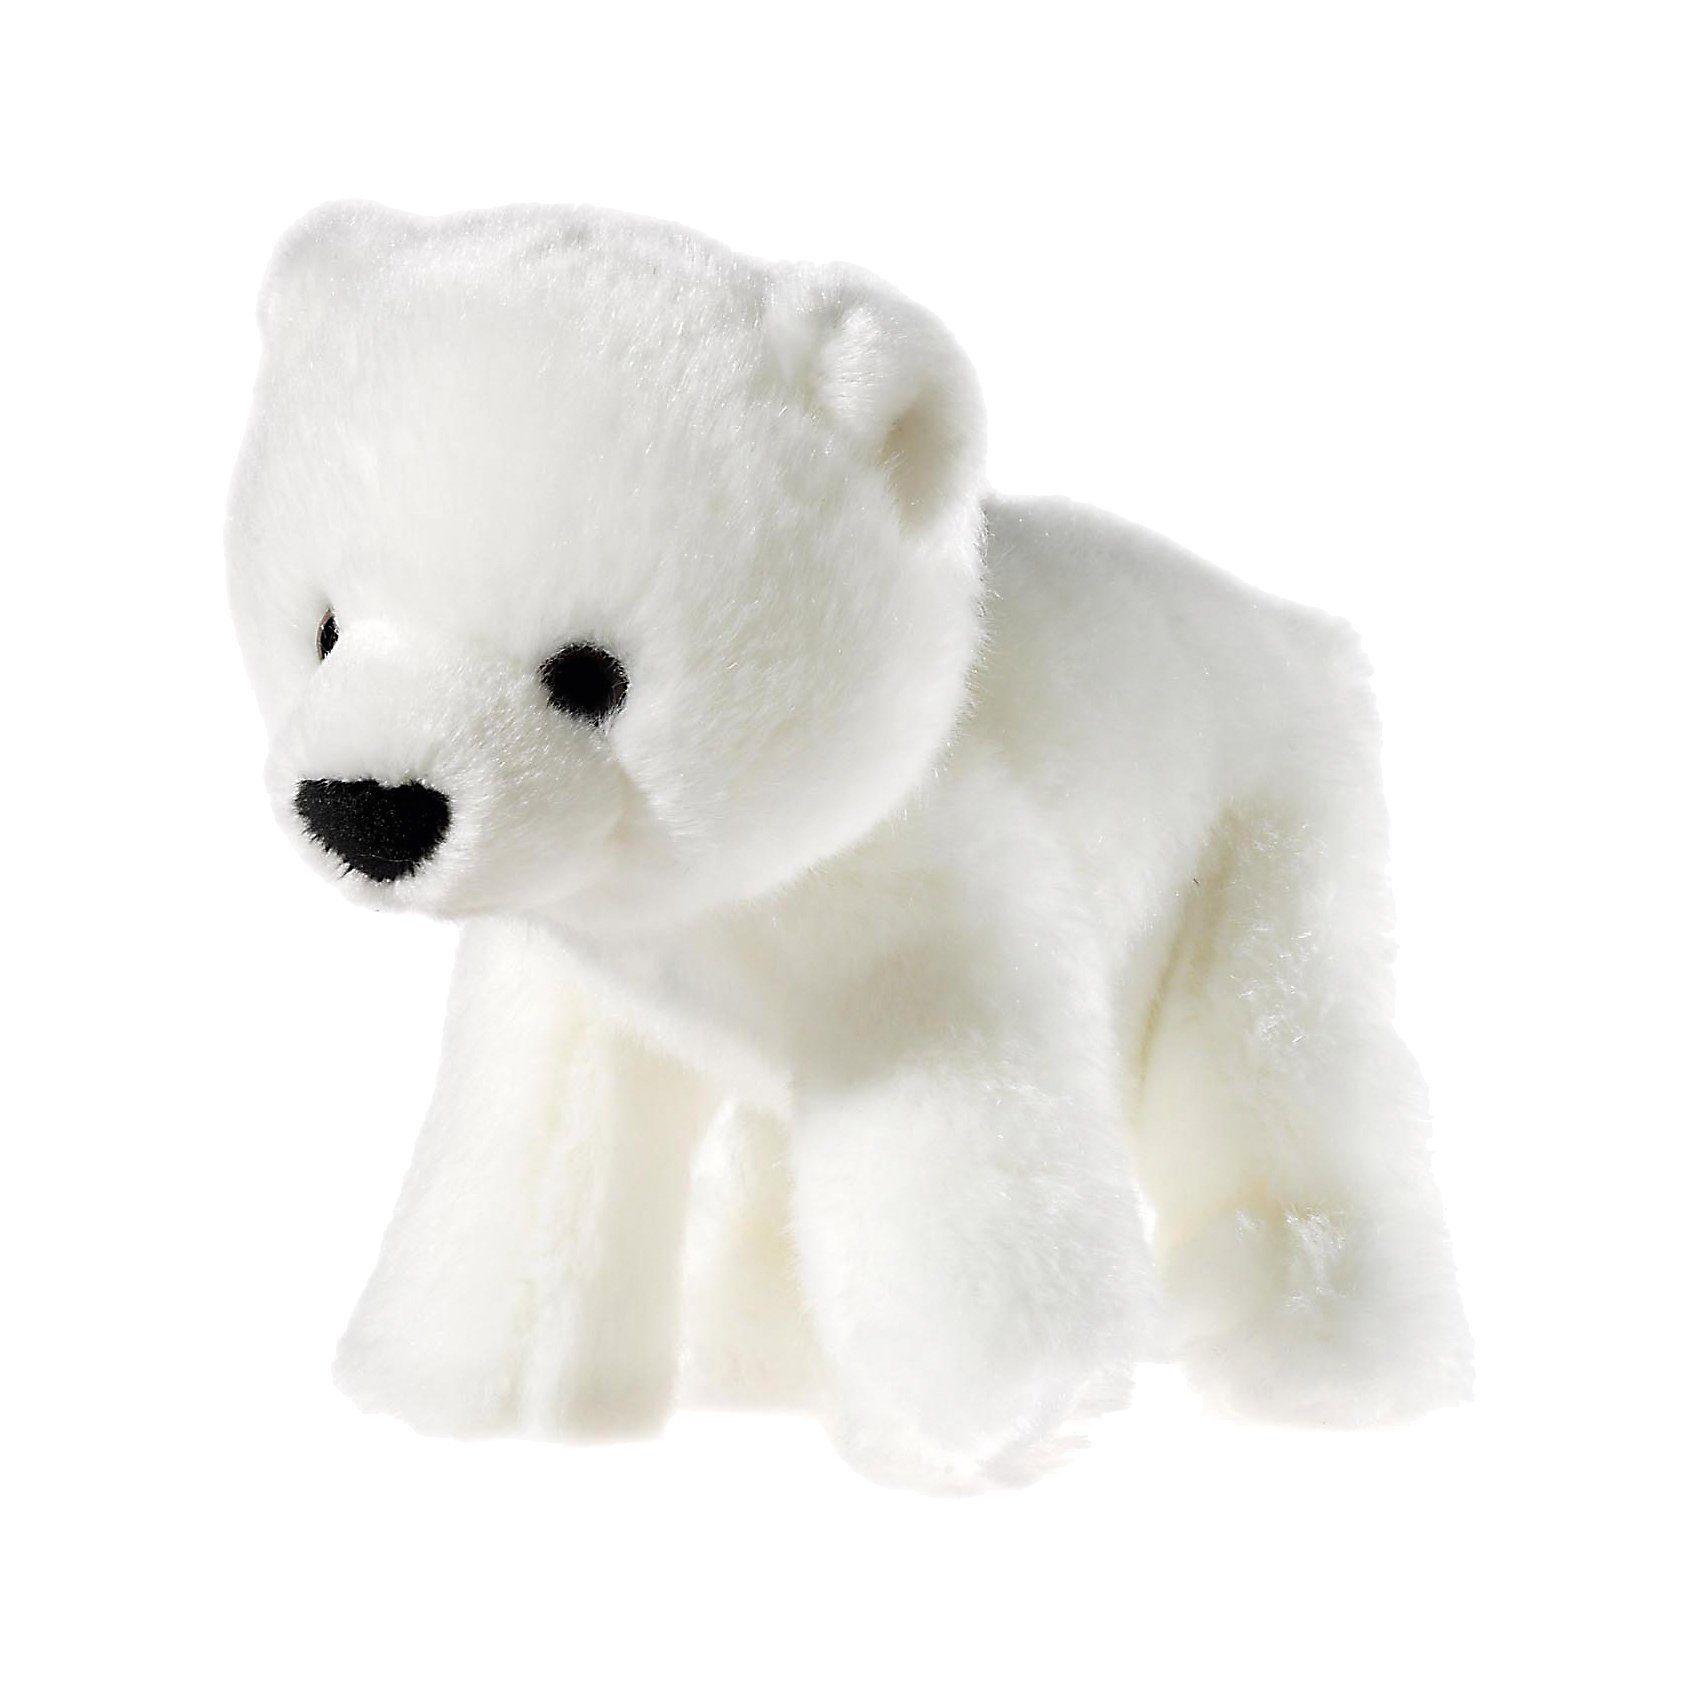 Heunec MI CLASSICO Baby Eisbär sitzend, 20 cm